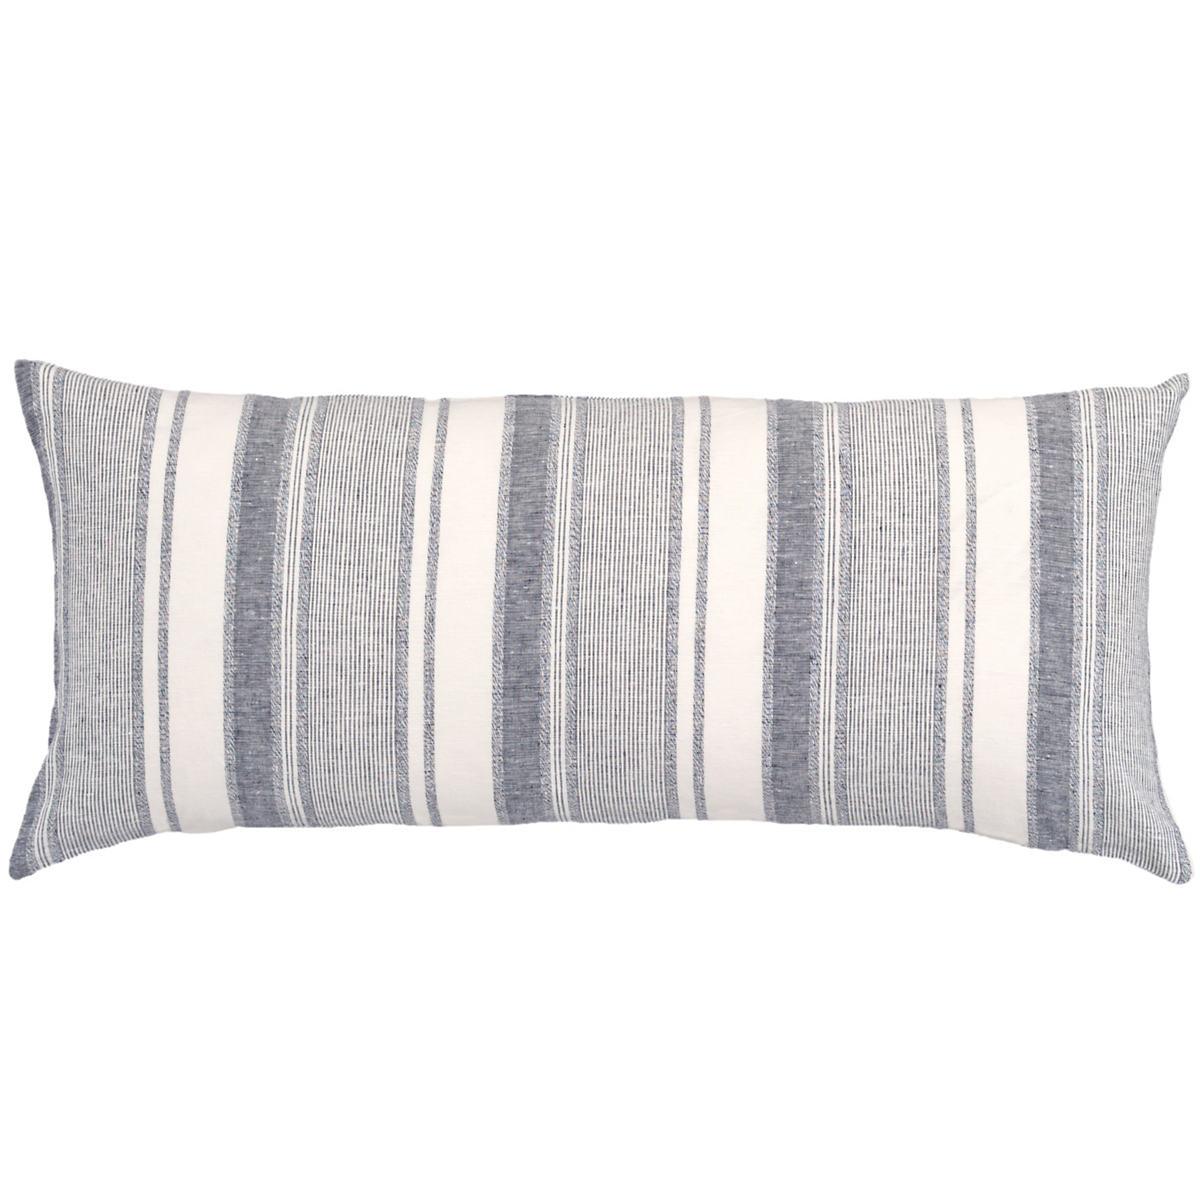 Hampton Ticking Linen Indigo Decorative Pillow